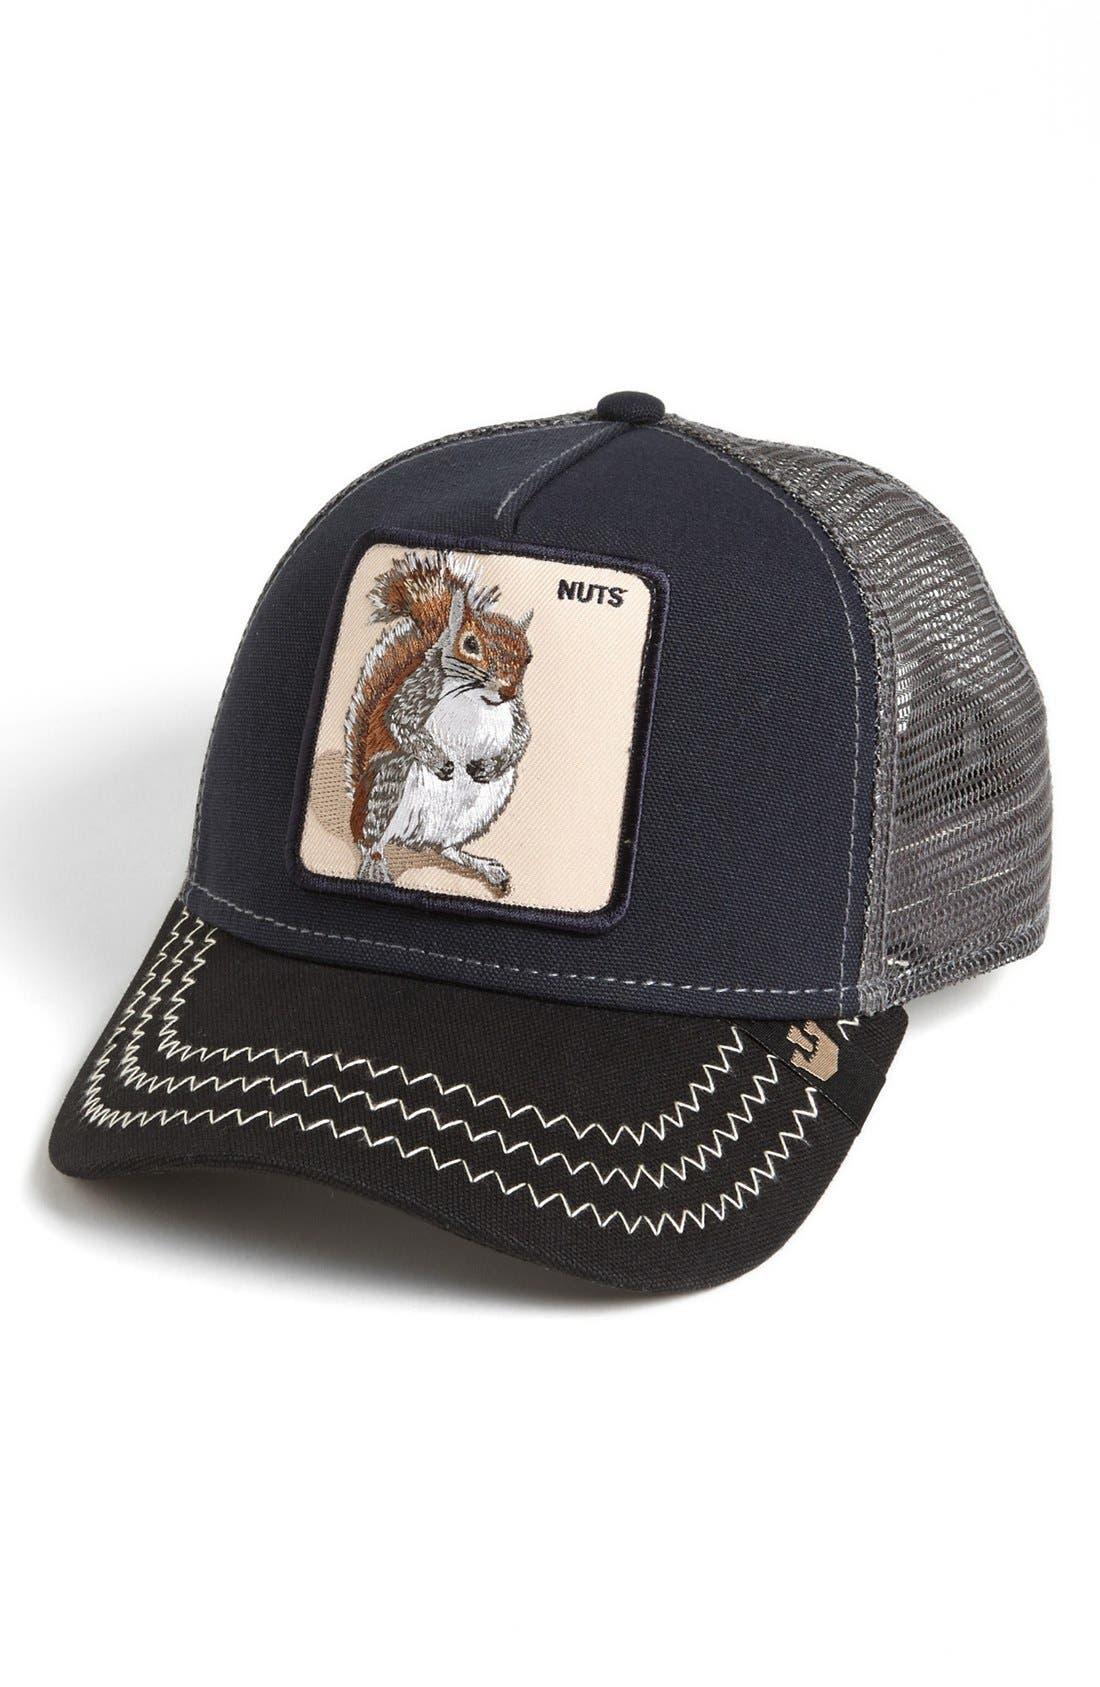 Goorin Brothers 'Animal Farm - Squirrel Master' Snapback Trucker Hat